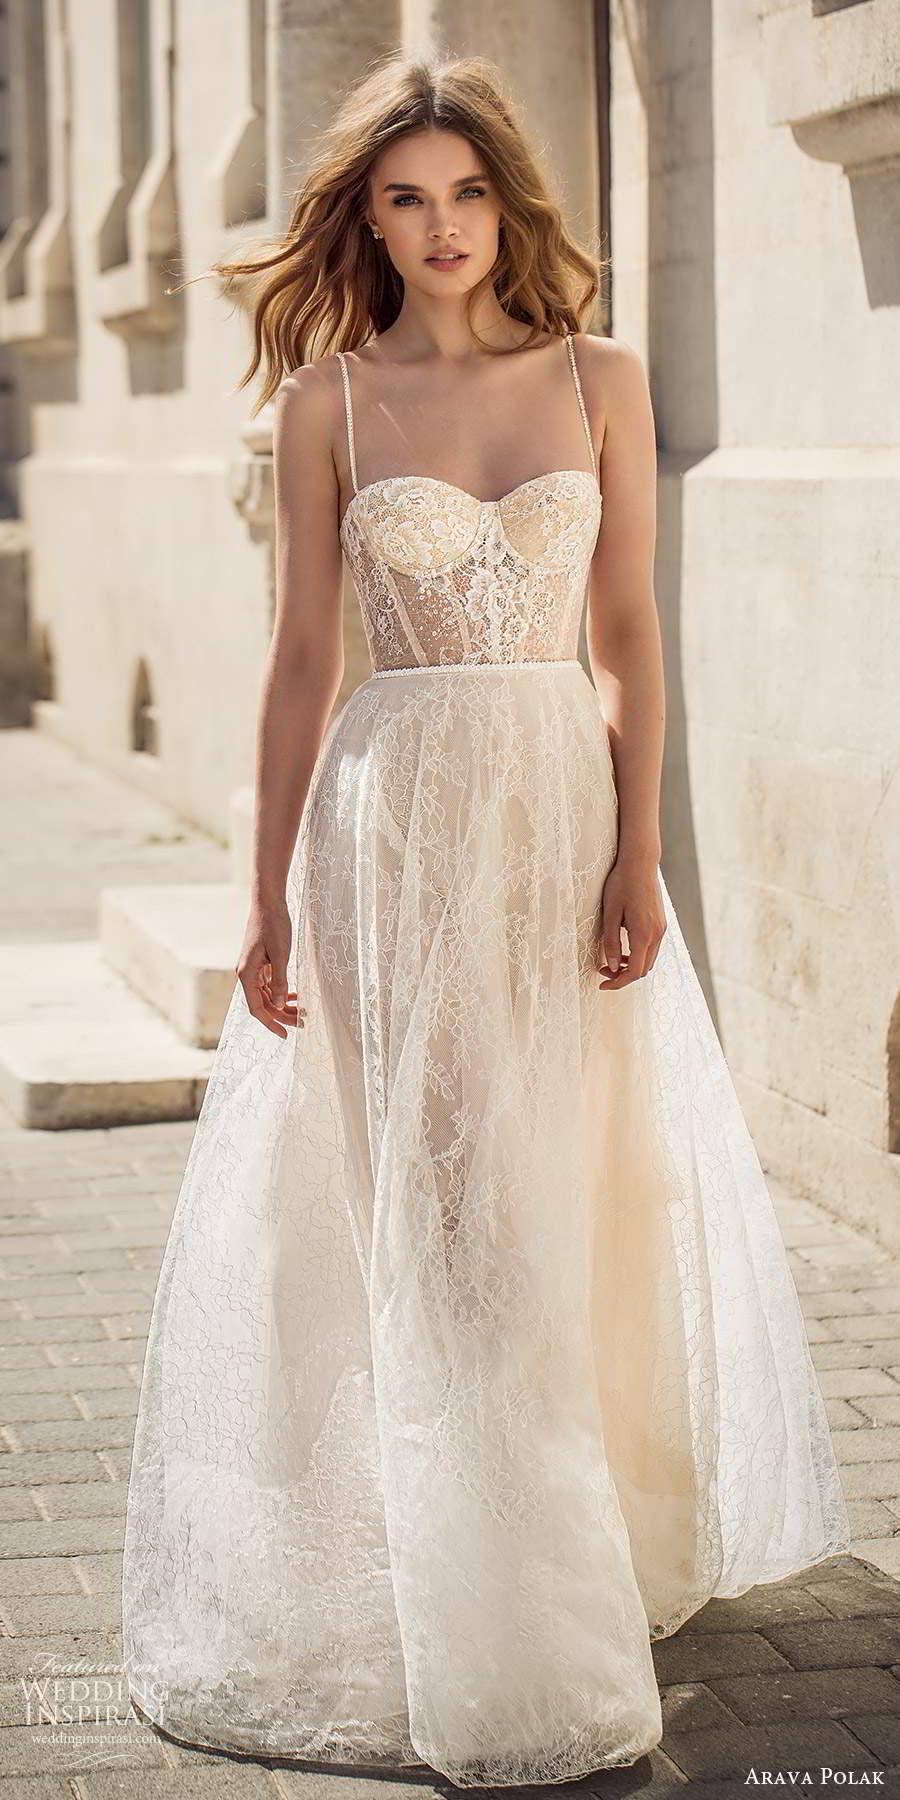 arava polak 2021 bridal sleeveless thin straps semi sweetheart necline fully embellished lace a line ball gown wedding dress chapel train (7) mv